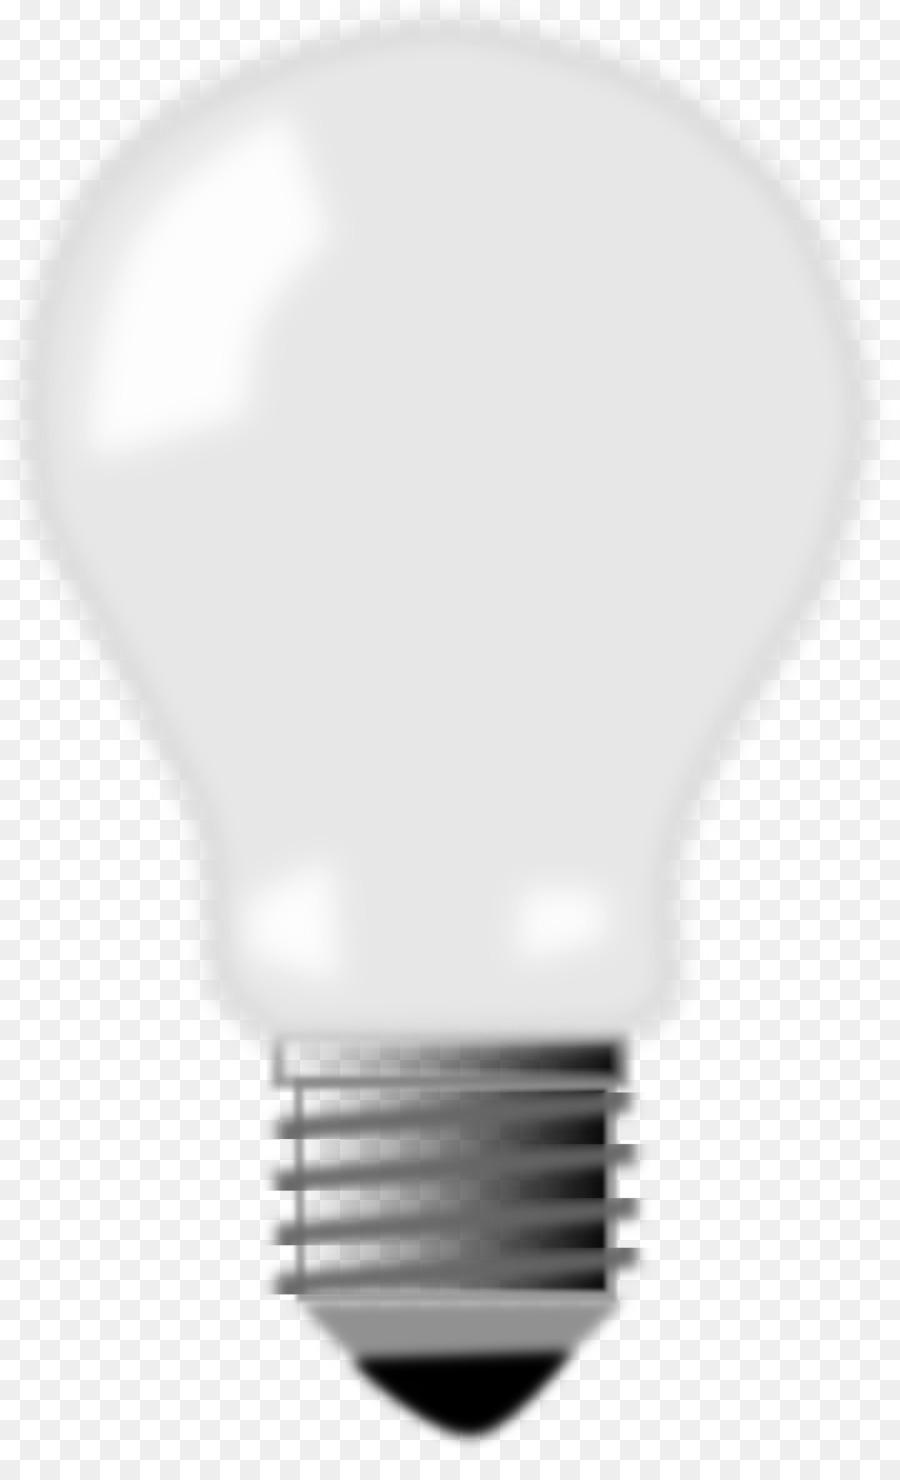 Light bulb battery clipart banner royalty free library Light Bulb Cartoon clipart - Product, Light, Line, transparent clip art banner royalty free library